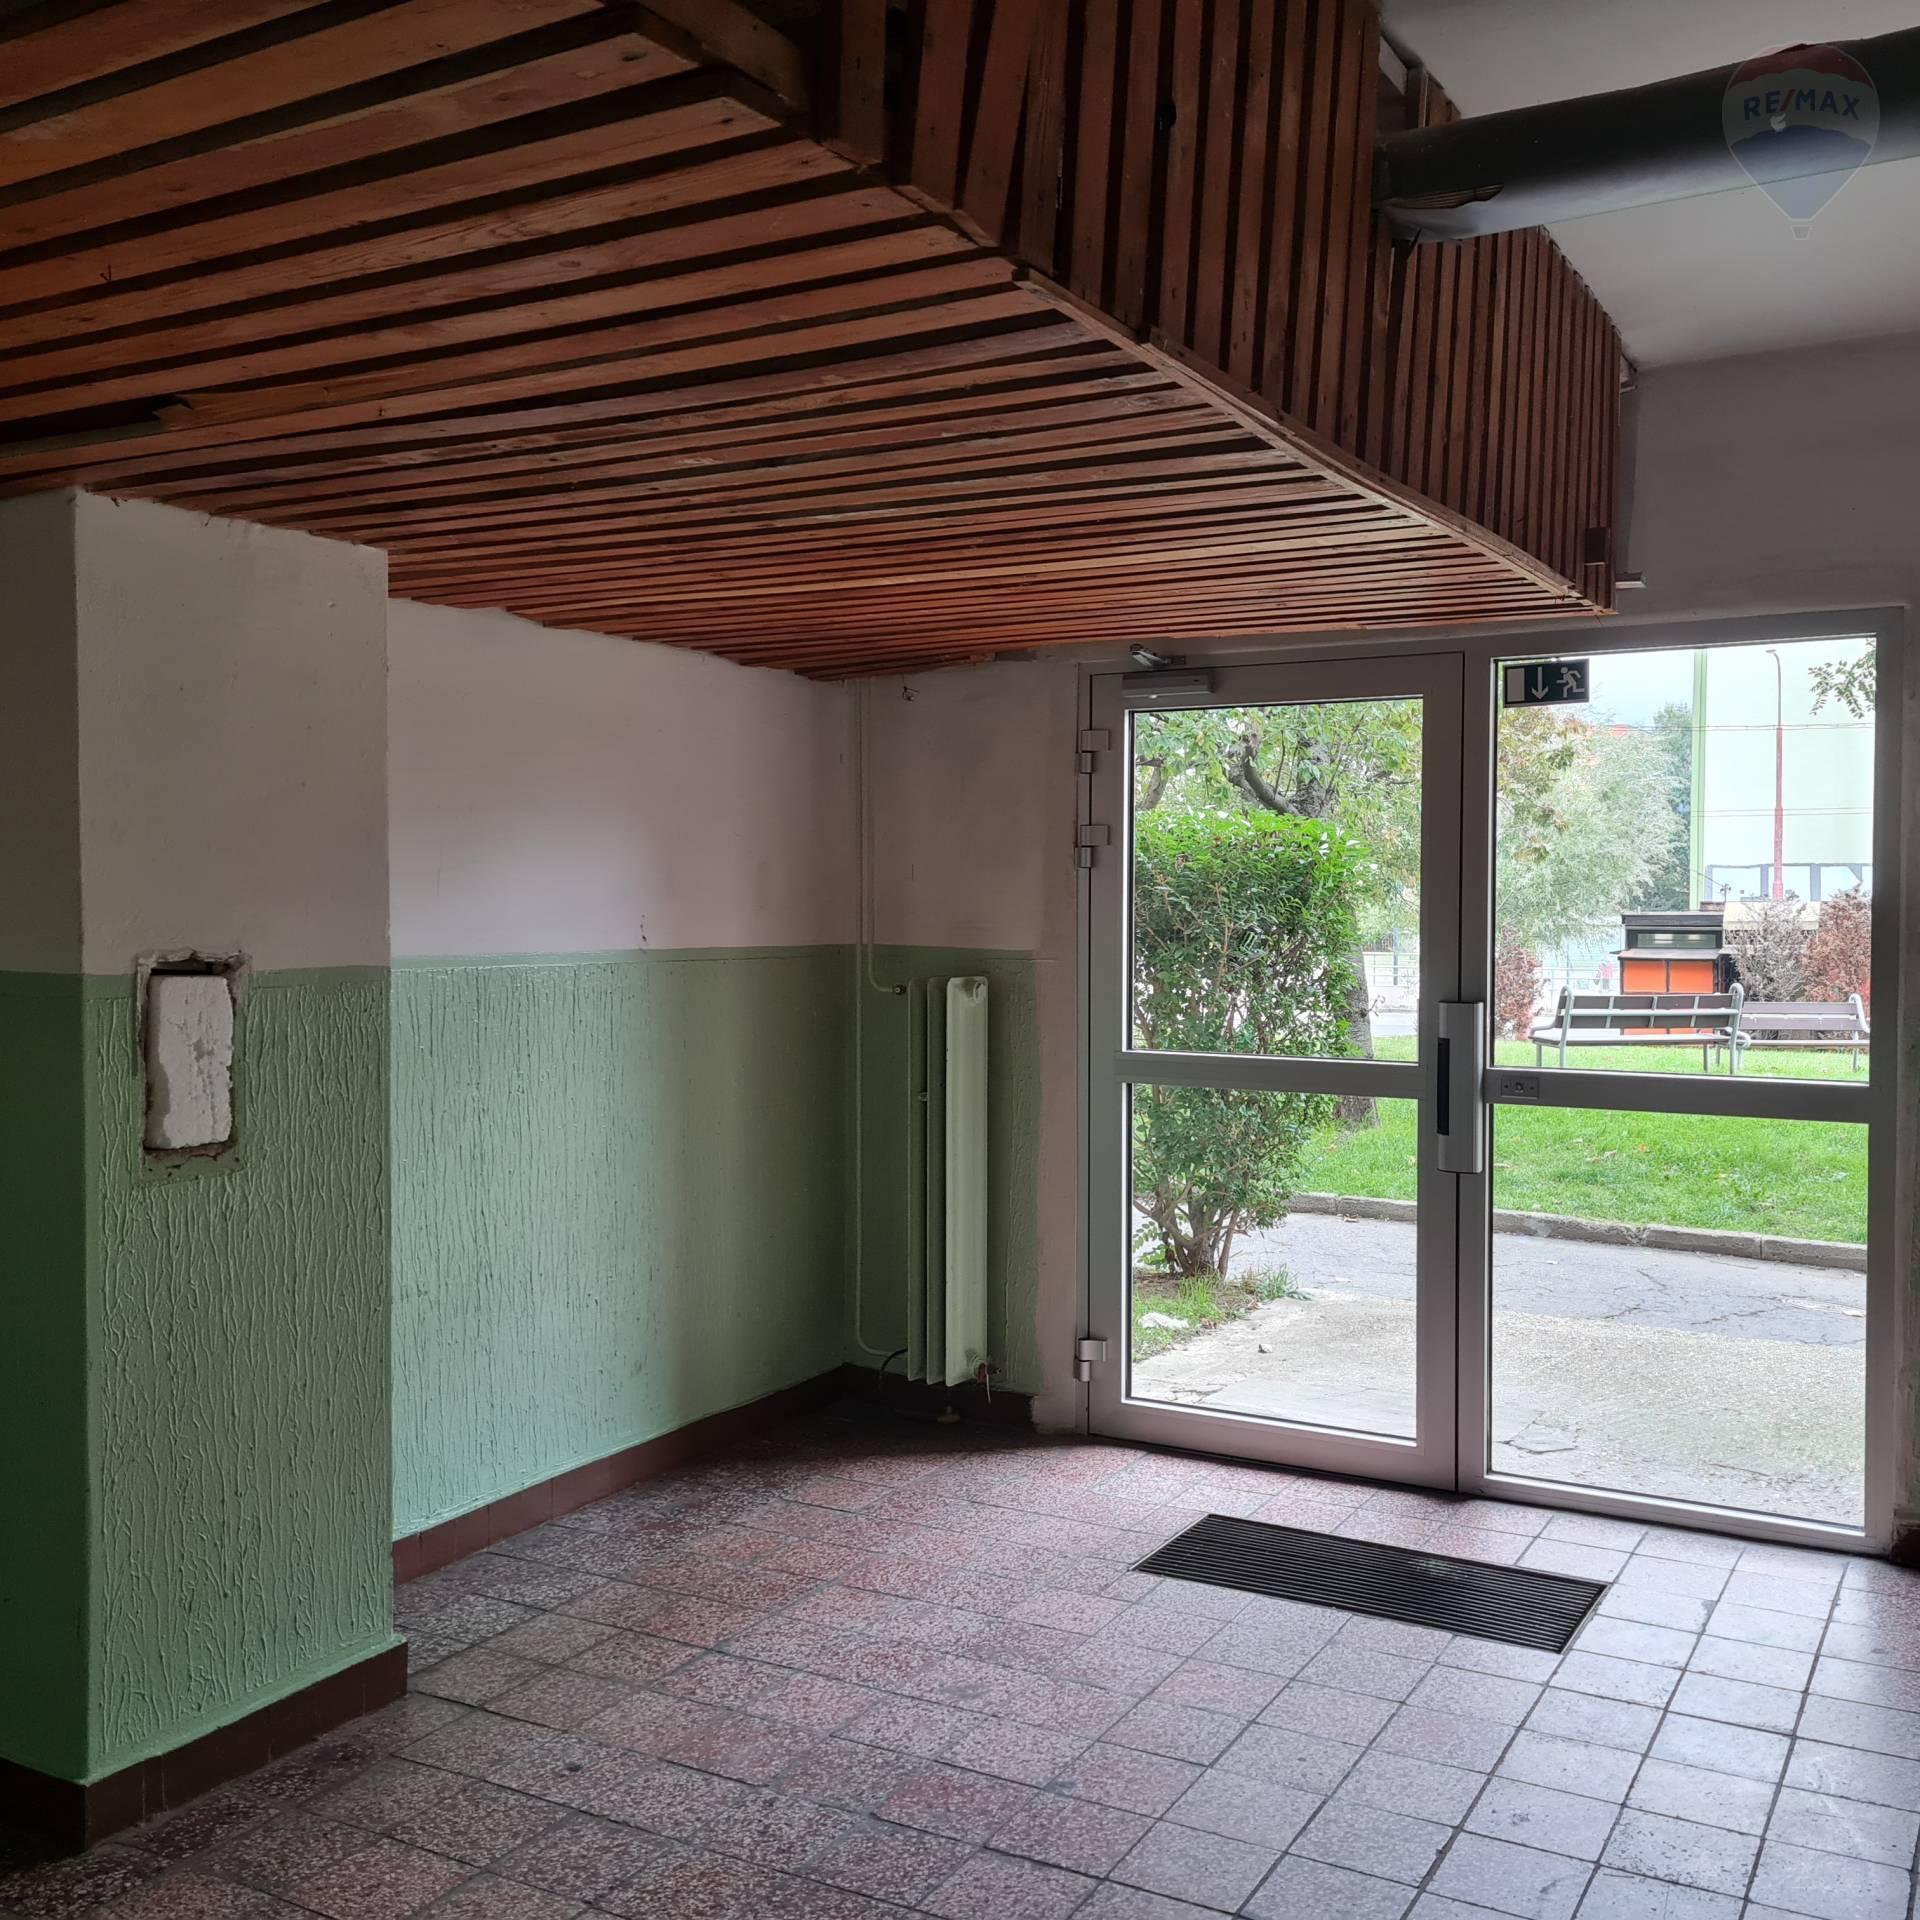 Predaj bytu (2 izbový) 57 m2, Bratislava - Dúbravka -